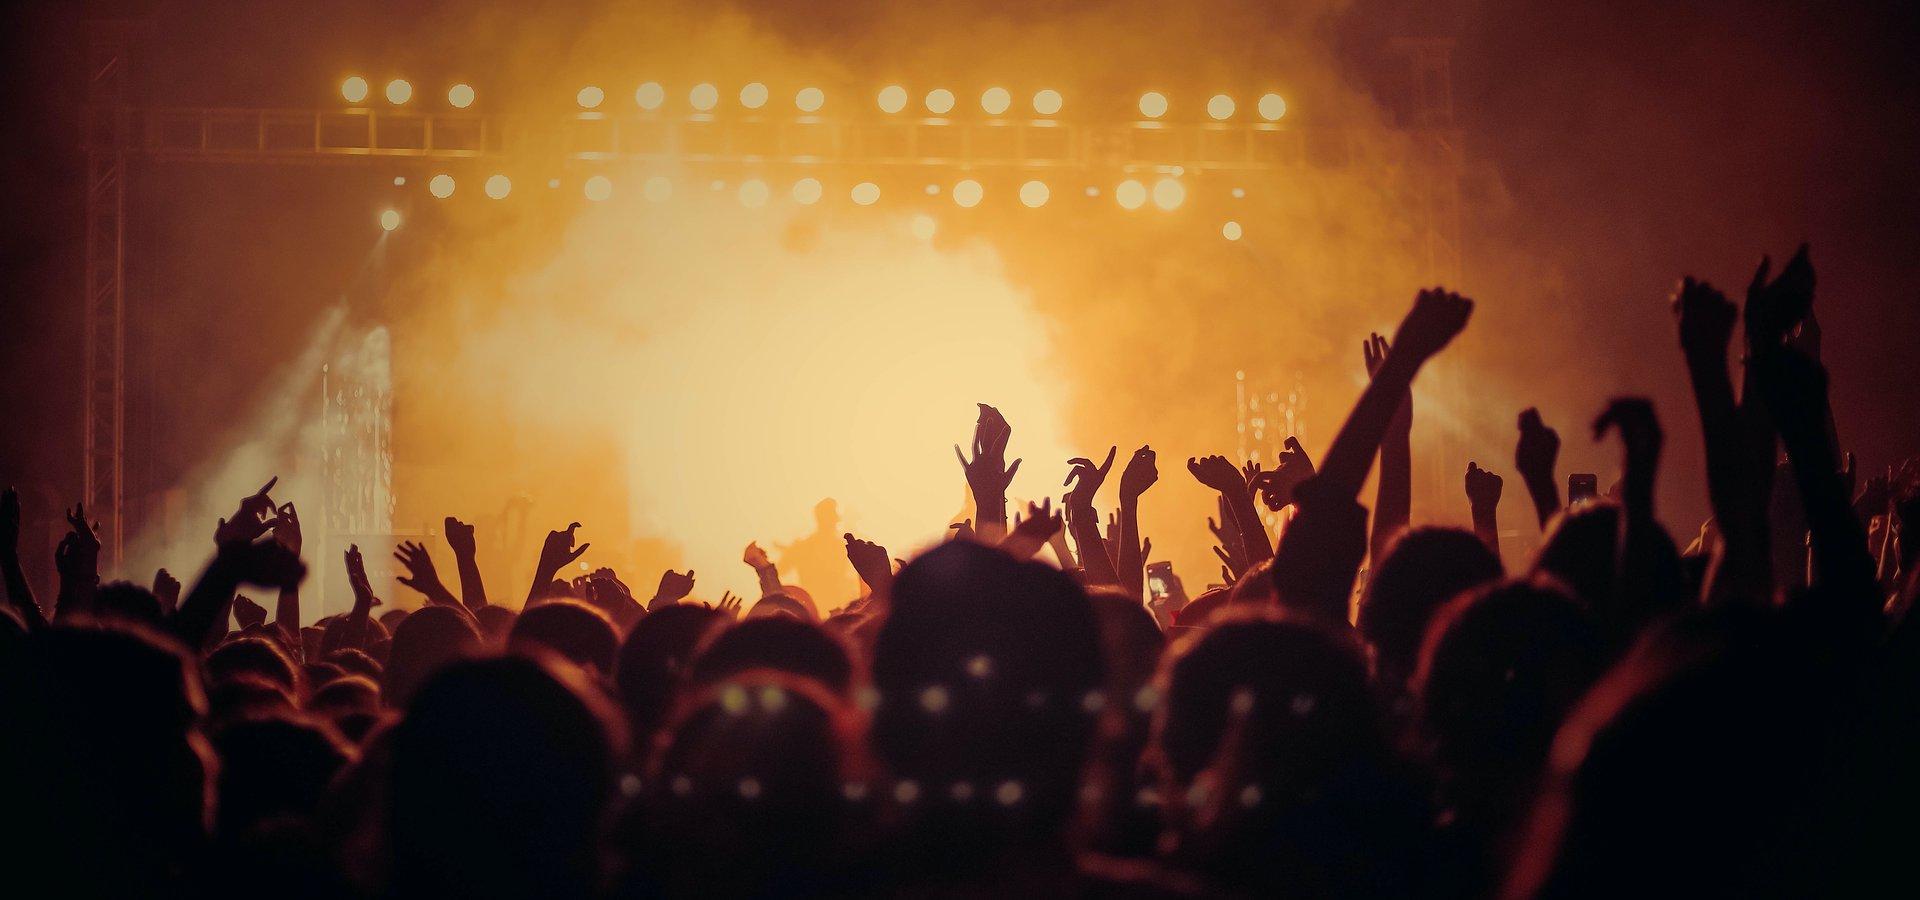 Loop Media Inks Distribution Deal for Music Videos